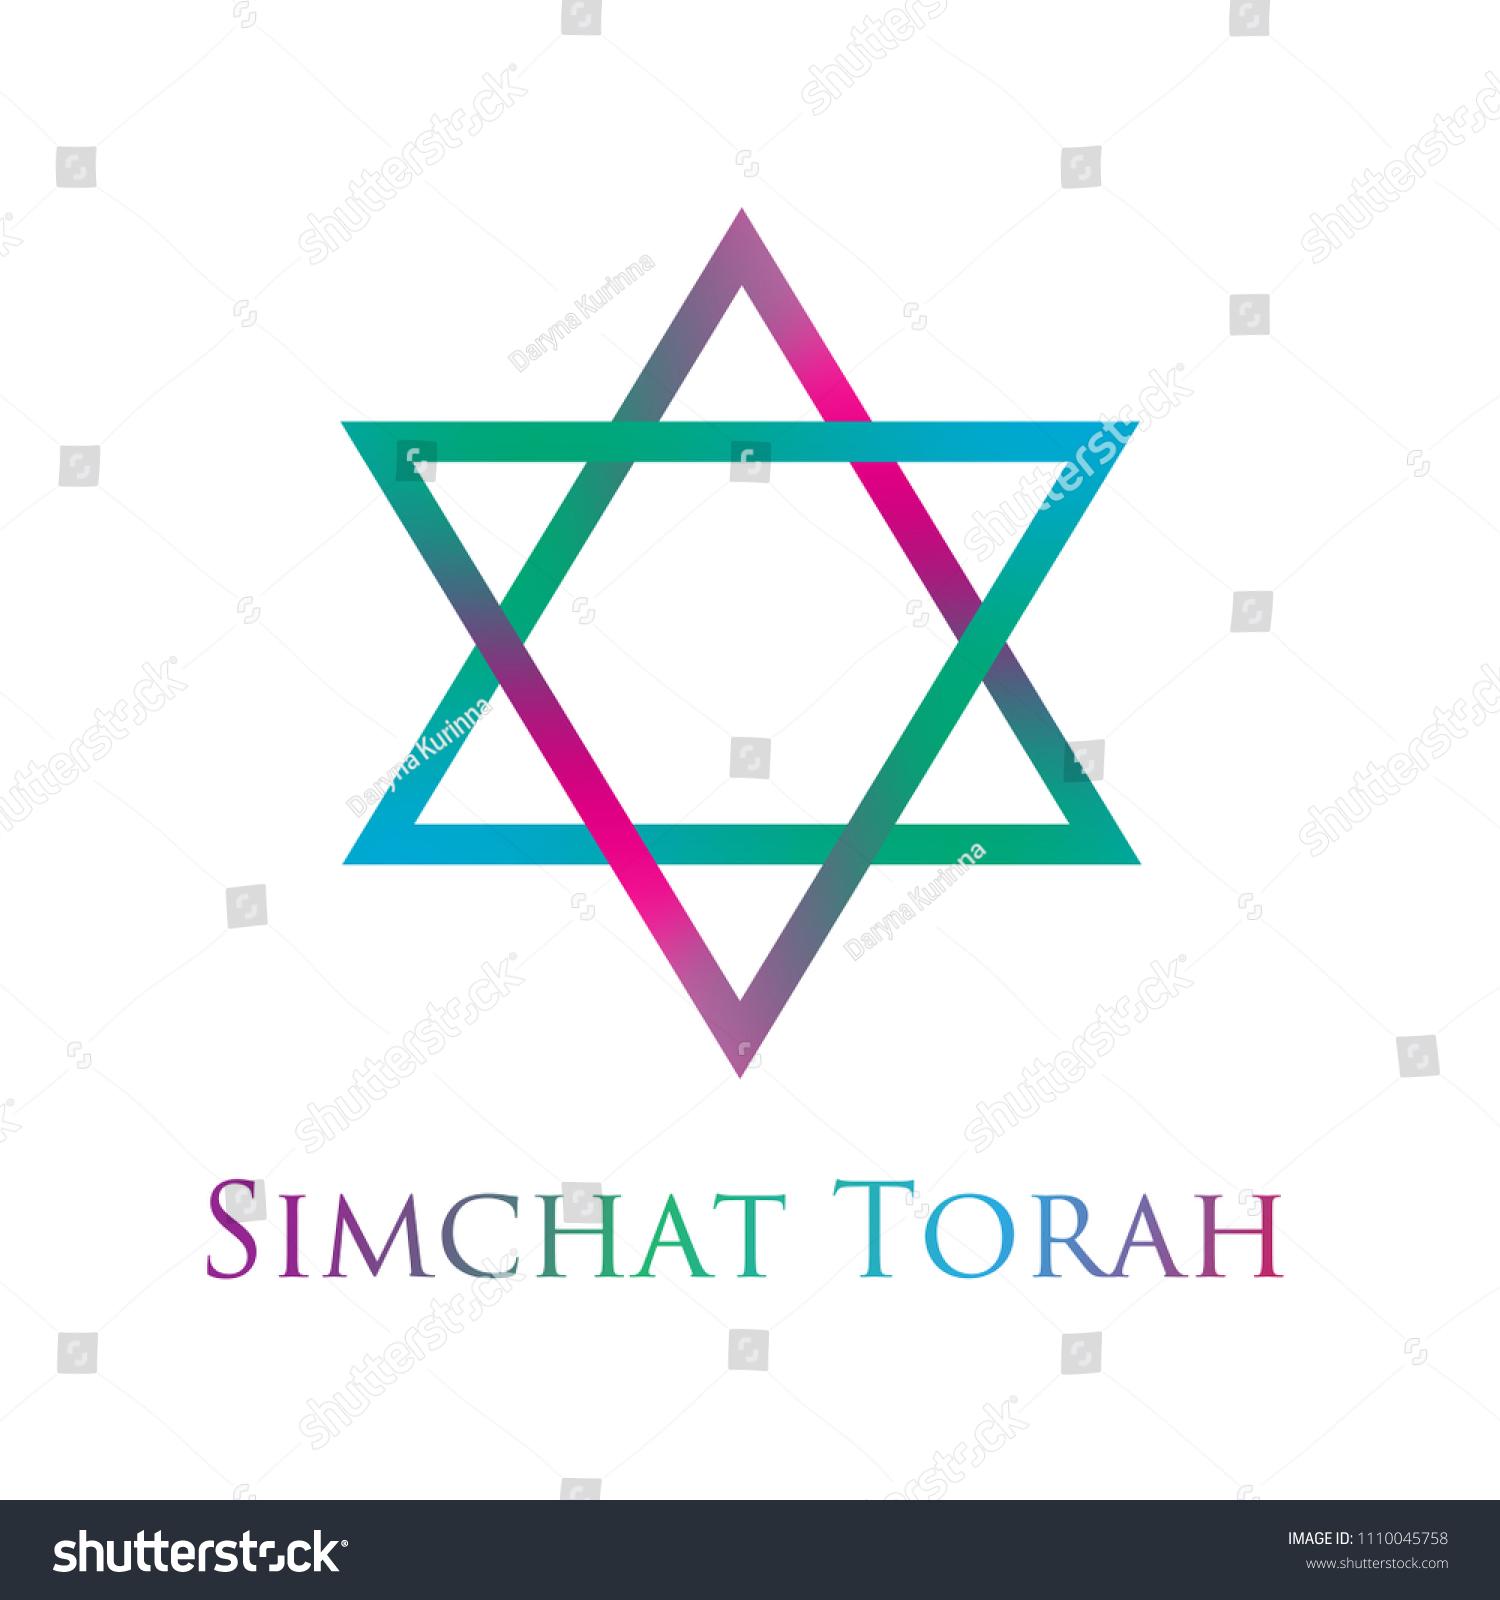 Simchat Torah Jewish Holiday Judaism Card Stock Vector 1110045758